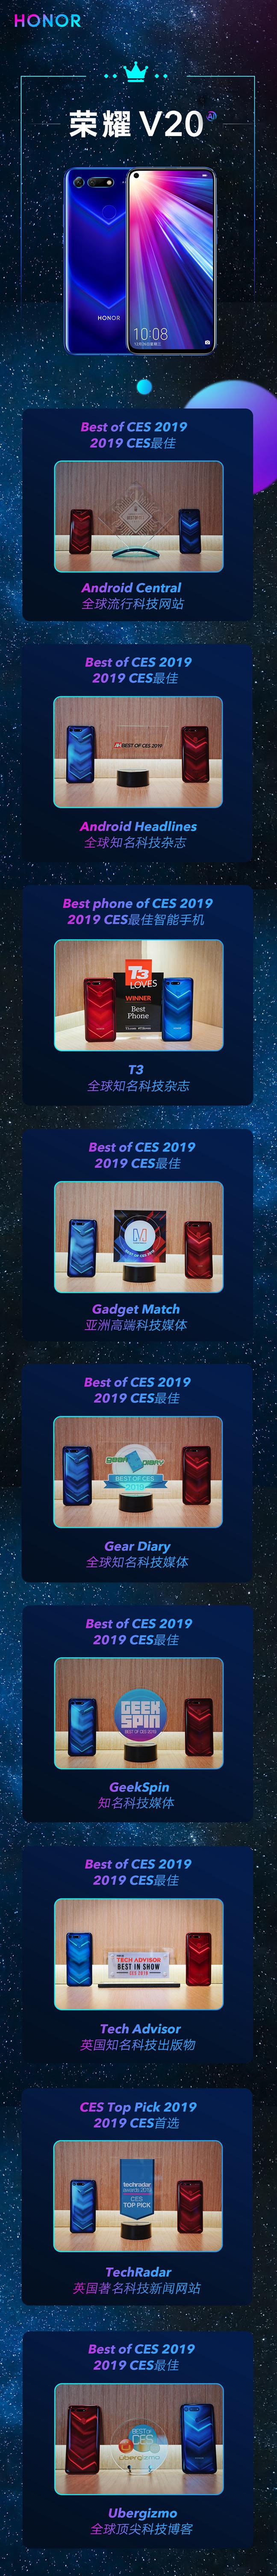 CES多项殊荣加身,荣耀V20给2019年旗舰开了个好头